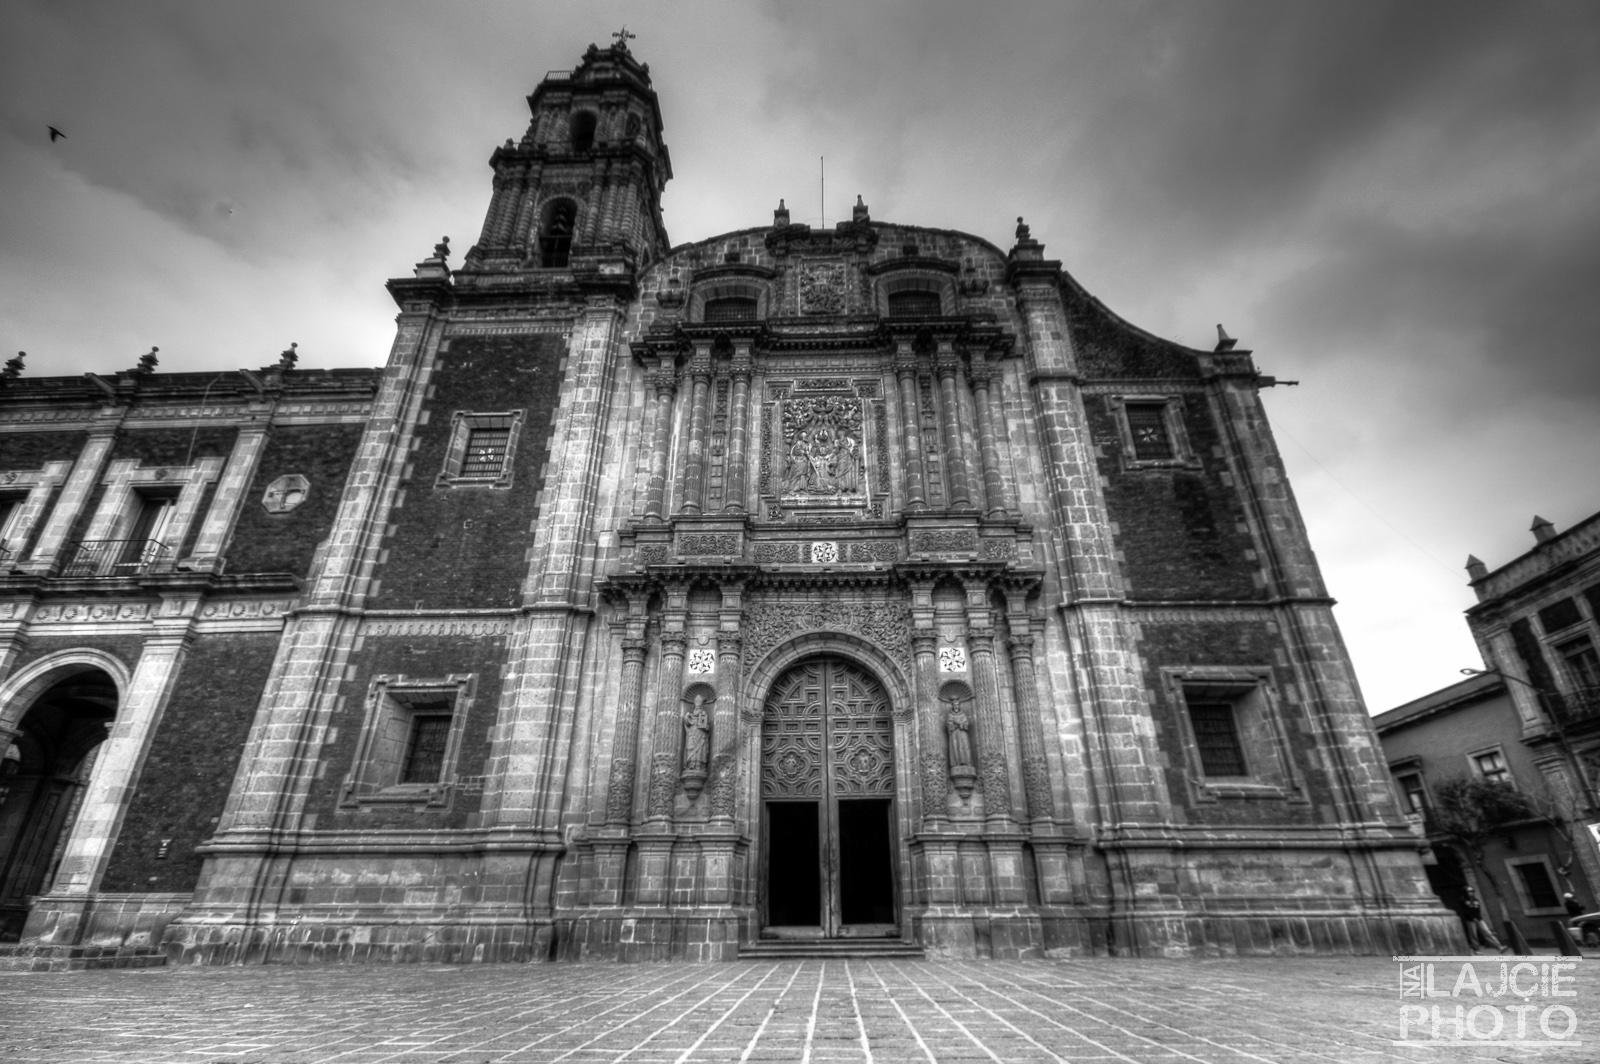 Iglesia de Santo Domingo, Mexico